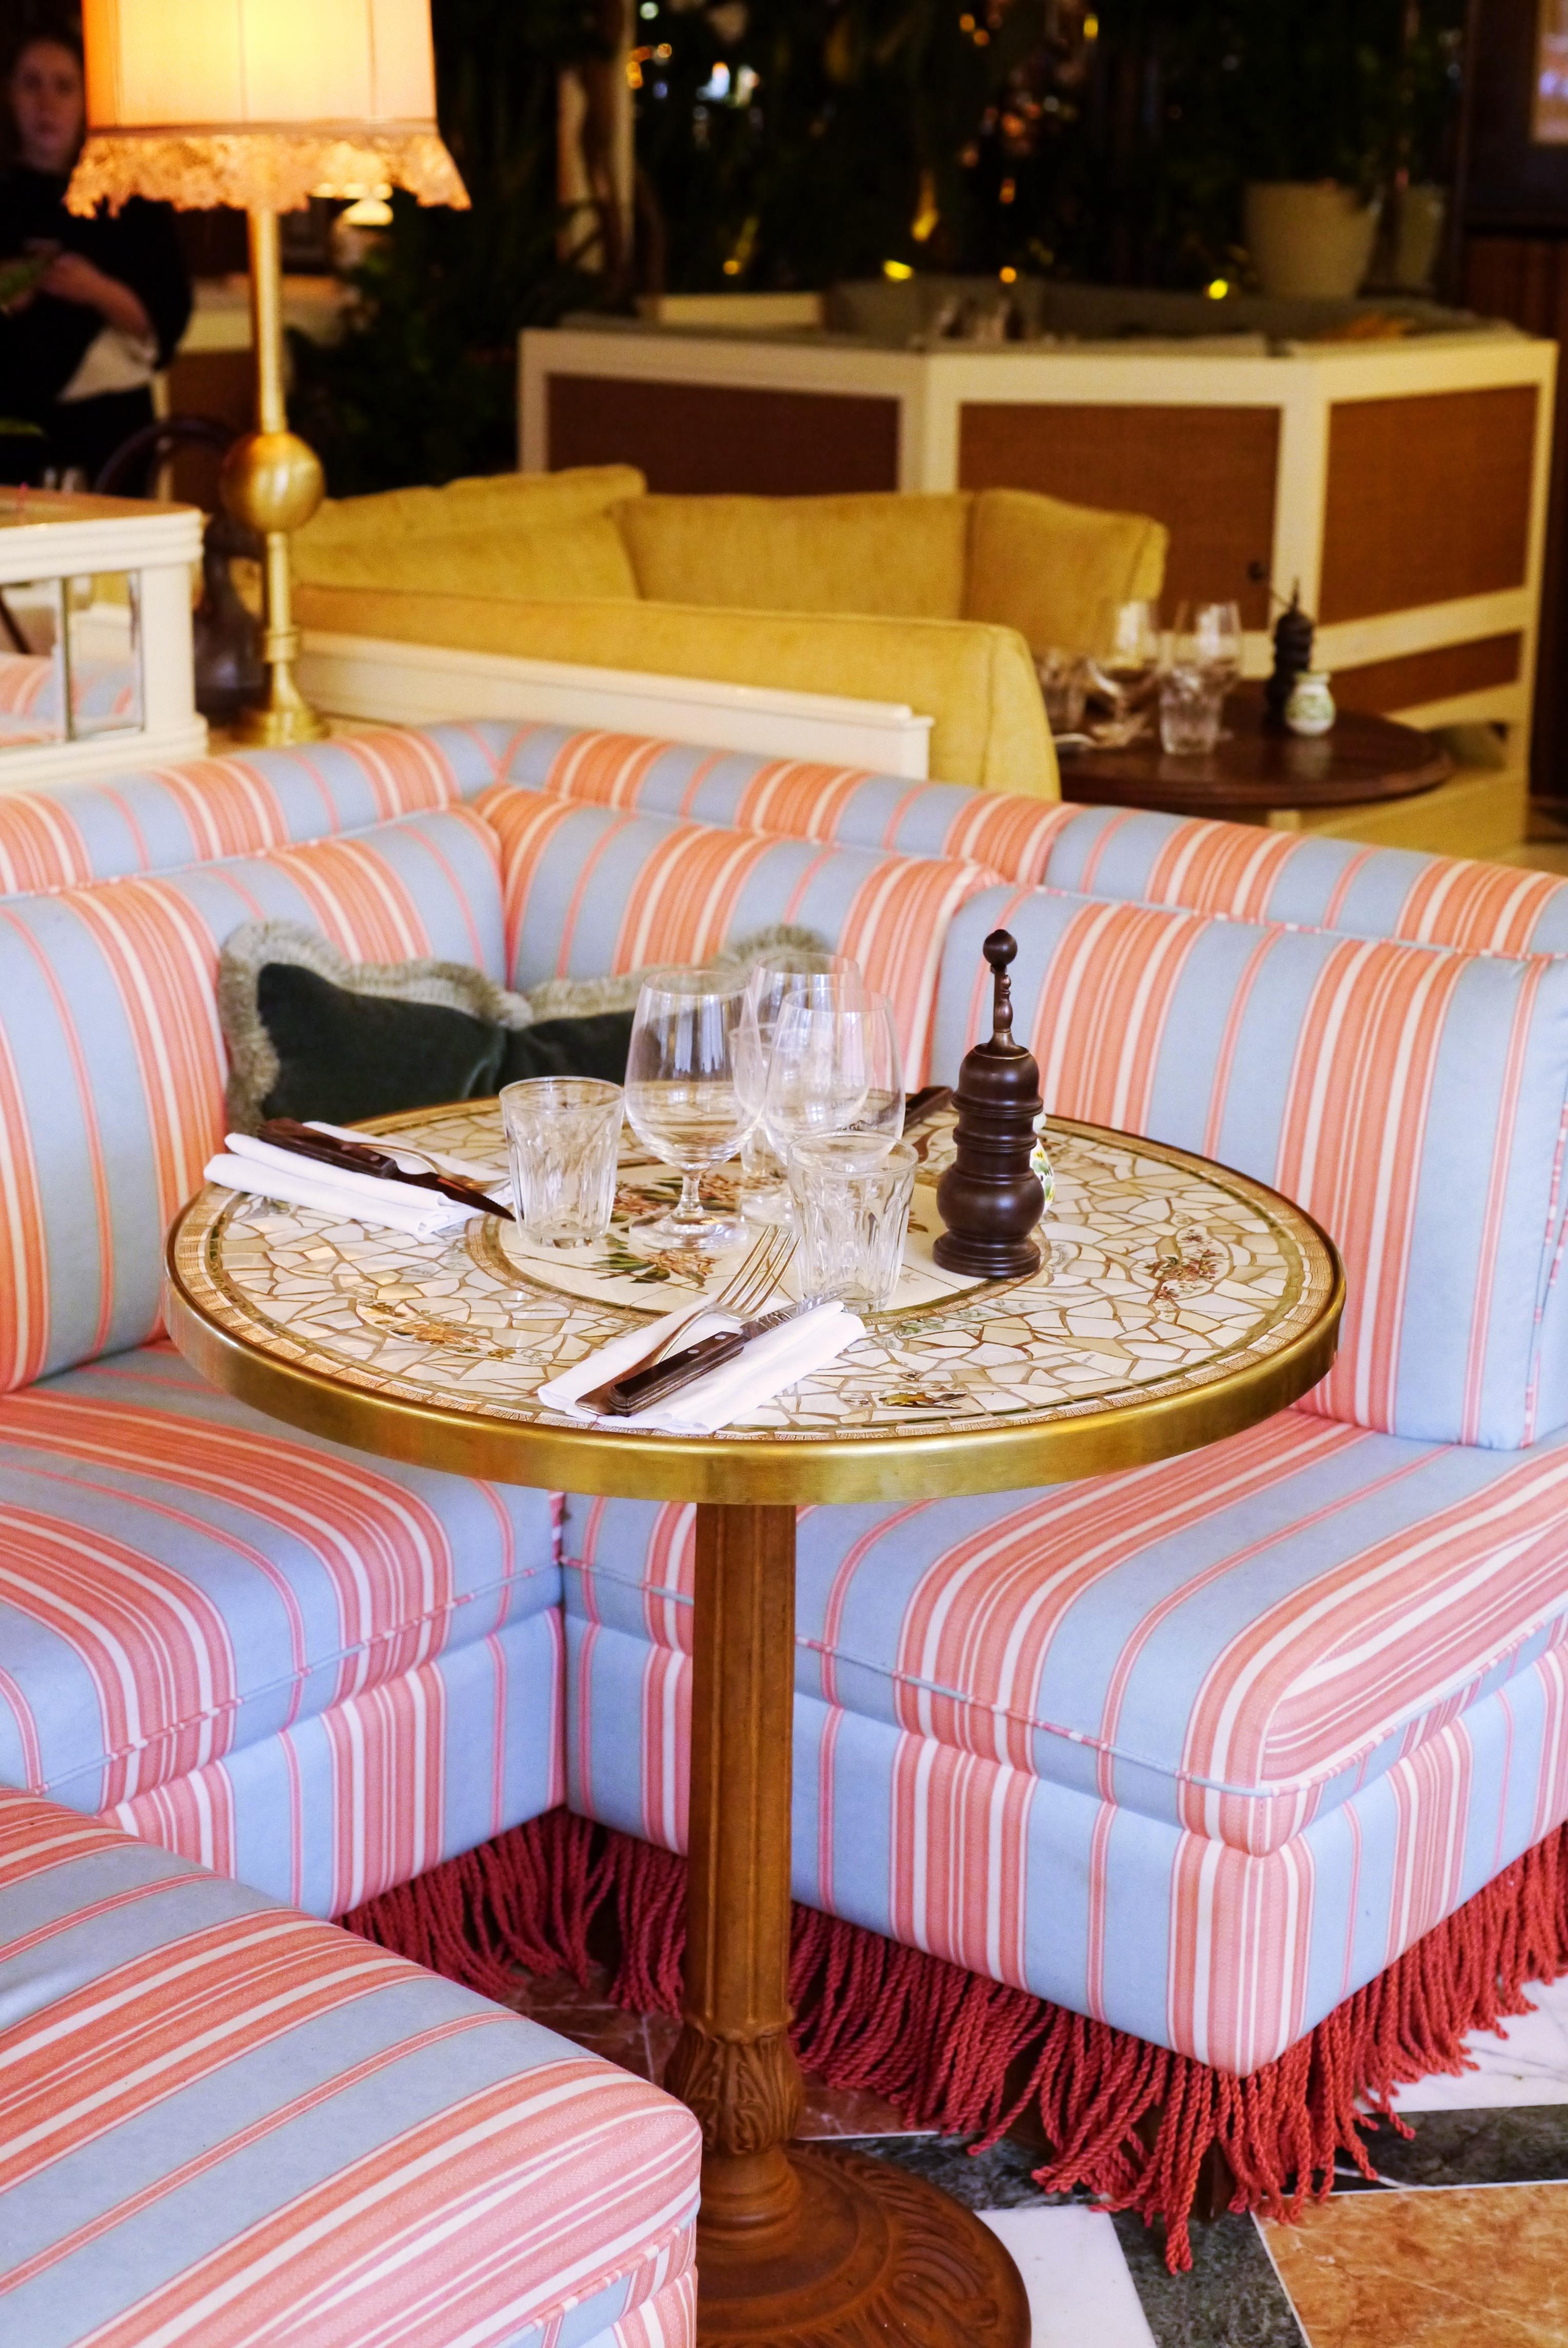 Gloria Italian restaurant from Big Mamma in Shoreditch: interiors at the trattoria